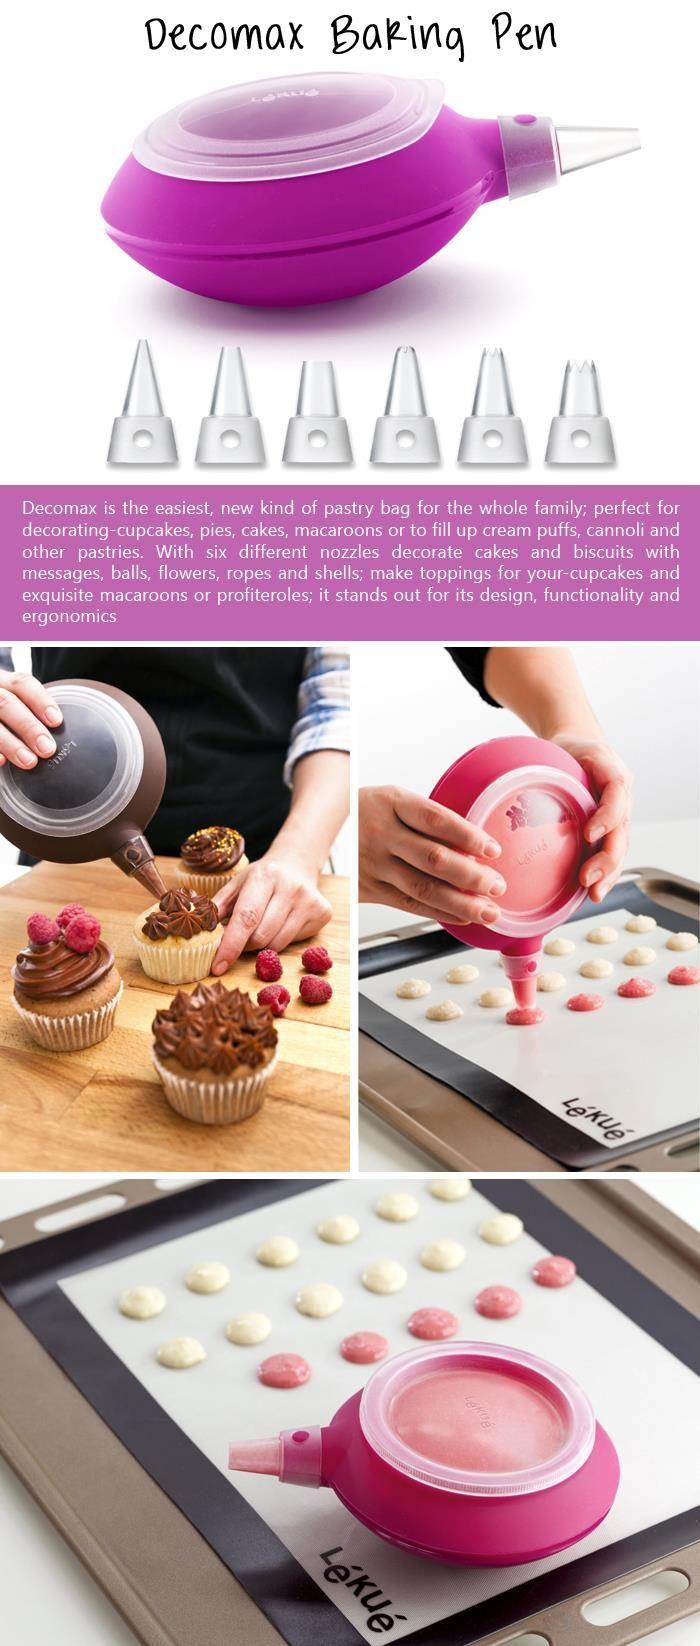 Uncategorized Top Ten Kitchen Appliances top ten kitchen gadgets that are borderline genius dulces y genius